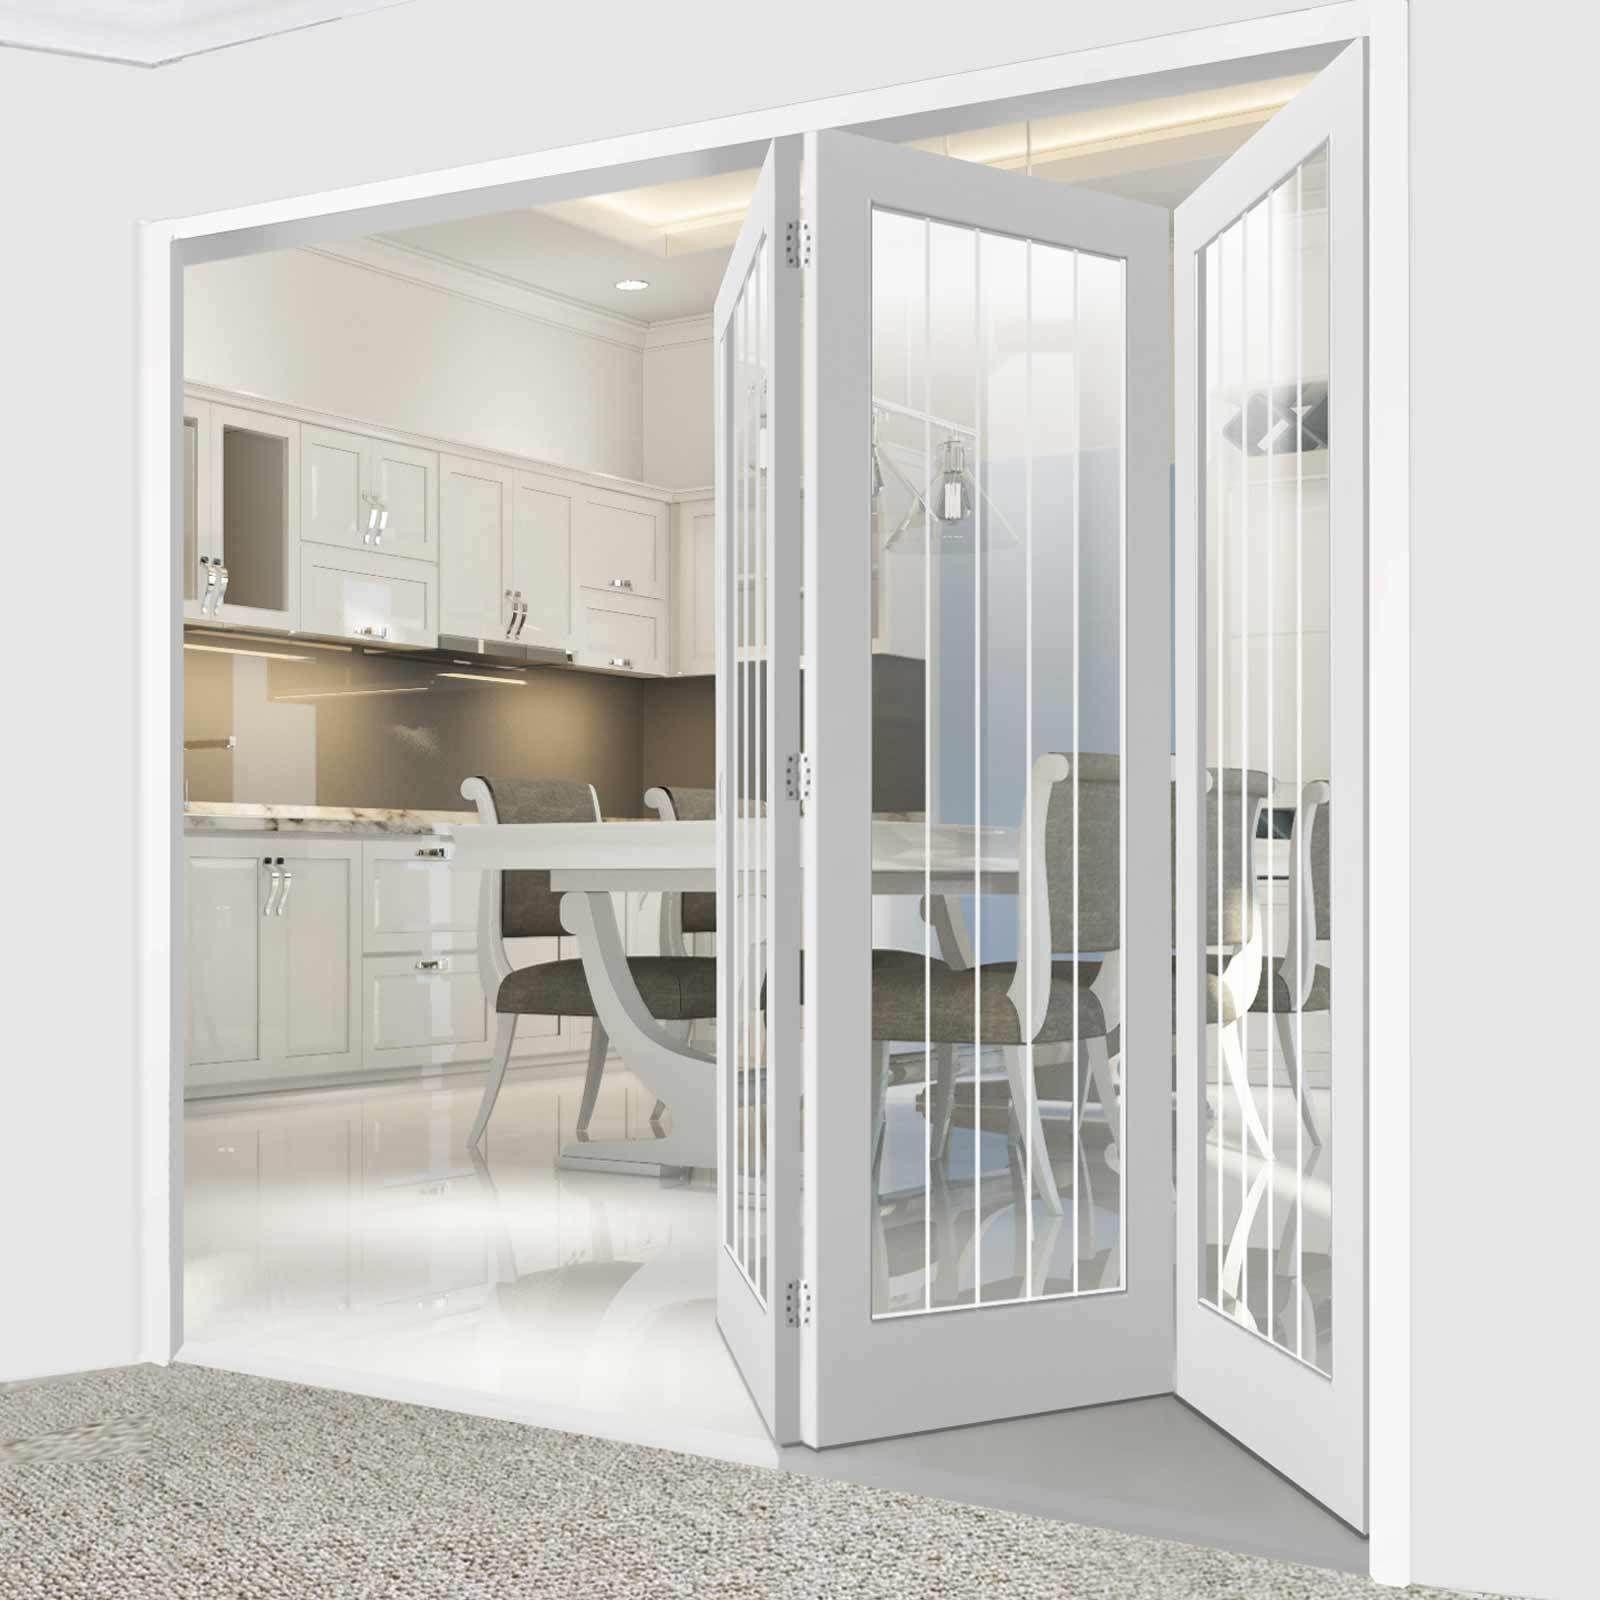 Thrufold Textured Vertical 5 Panel 3 0 Folding Door Etched Clear Glass Directdoors Moderndoors Dining Room Interiors Folding Doors Room Divider Doors